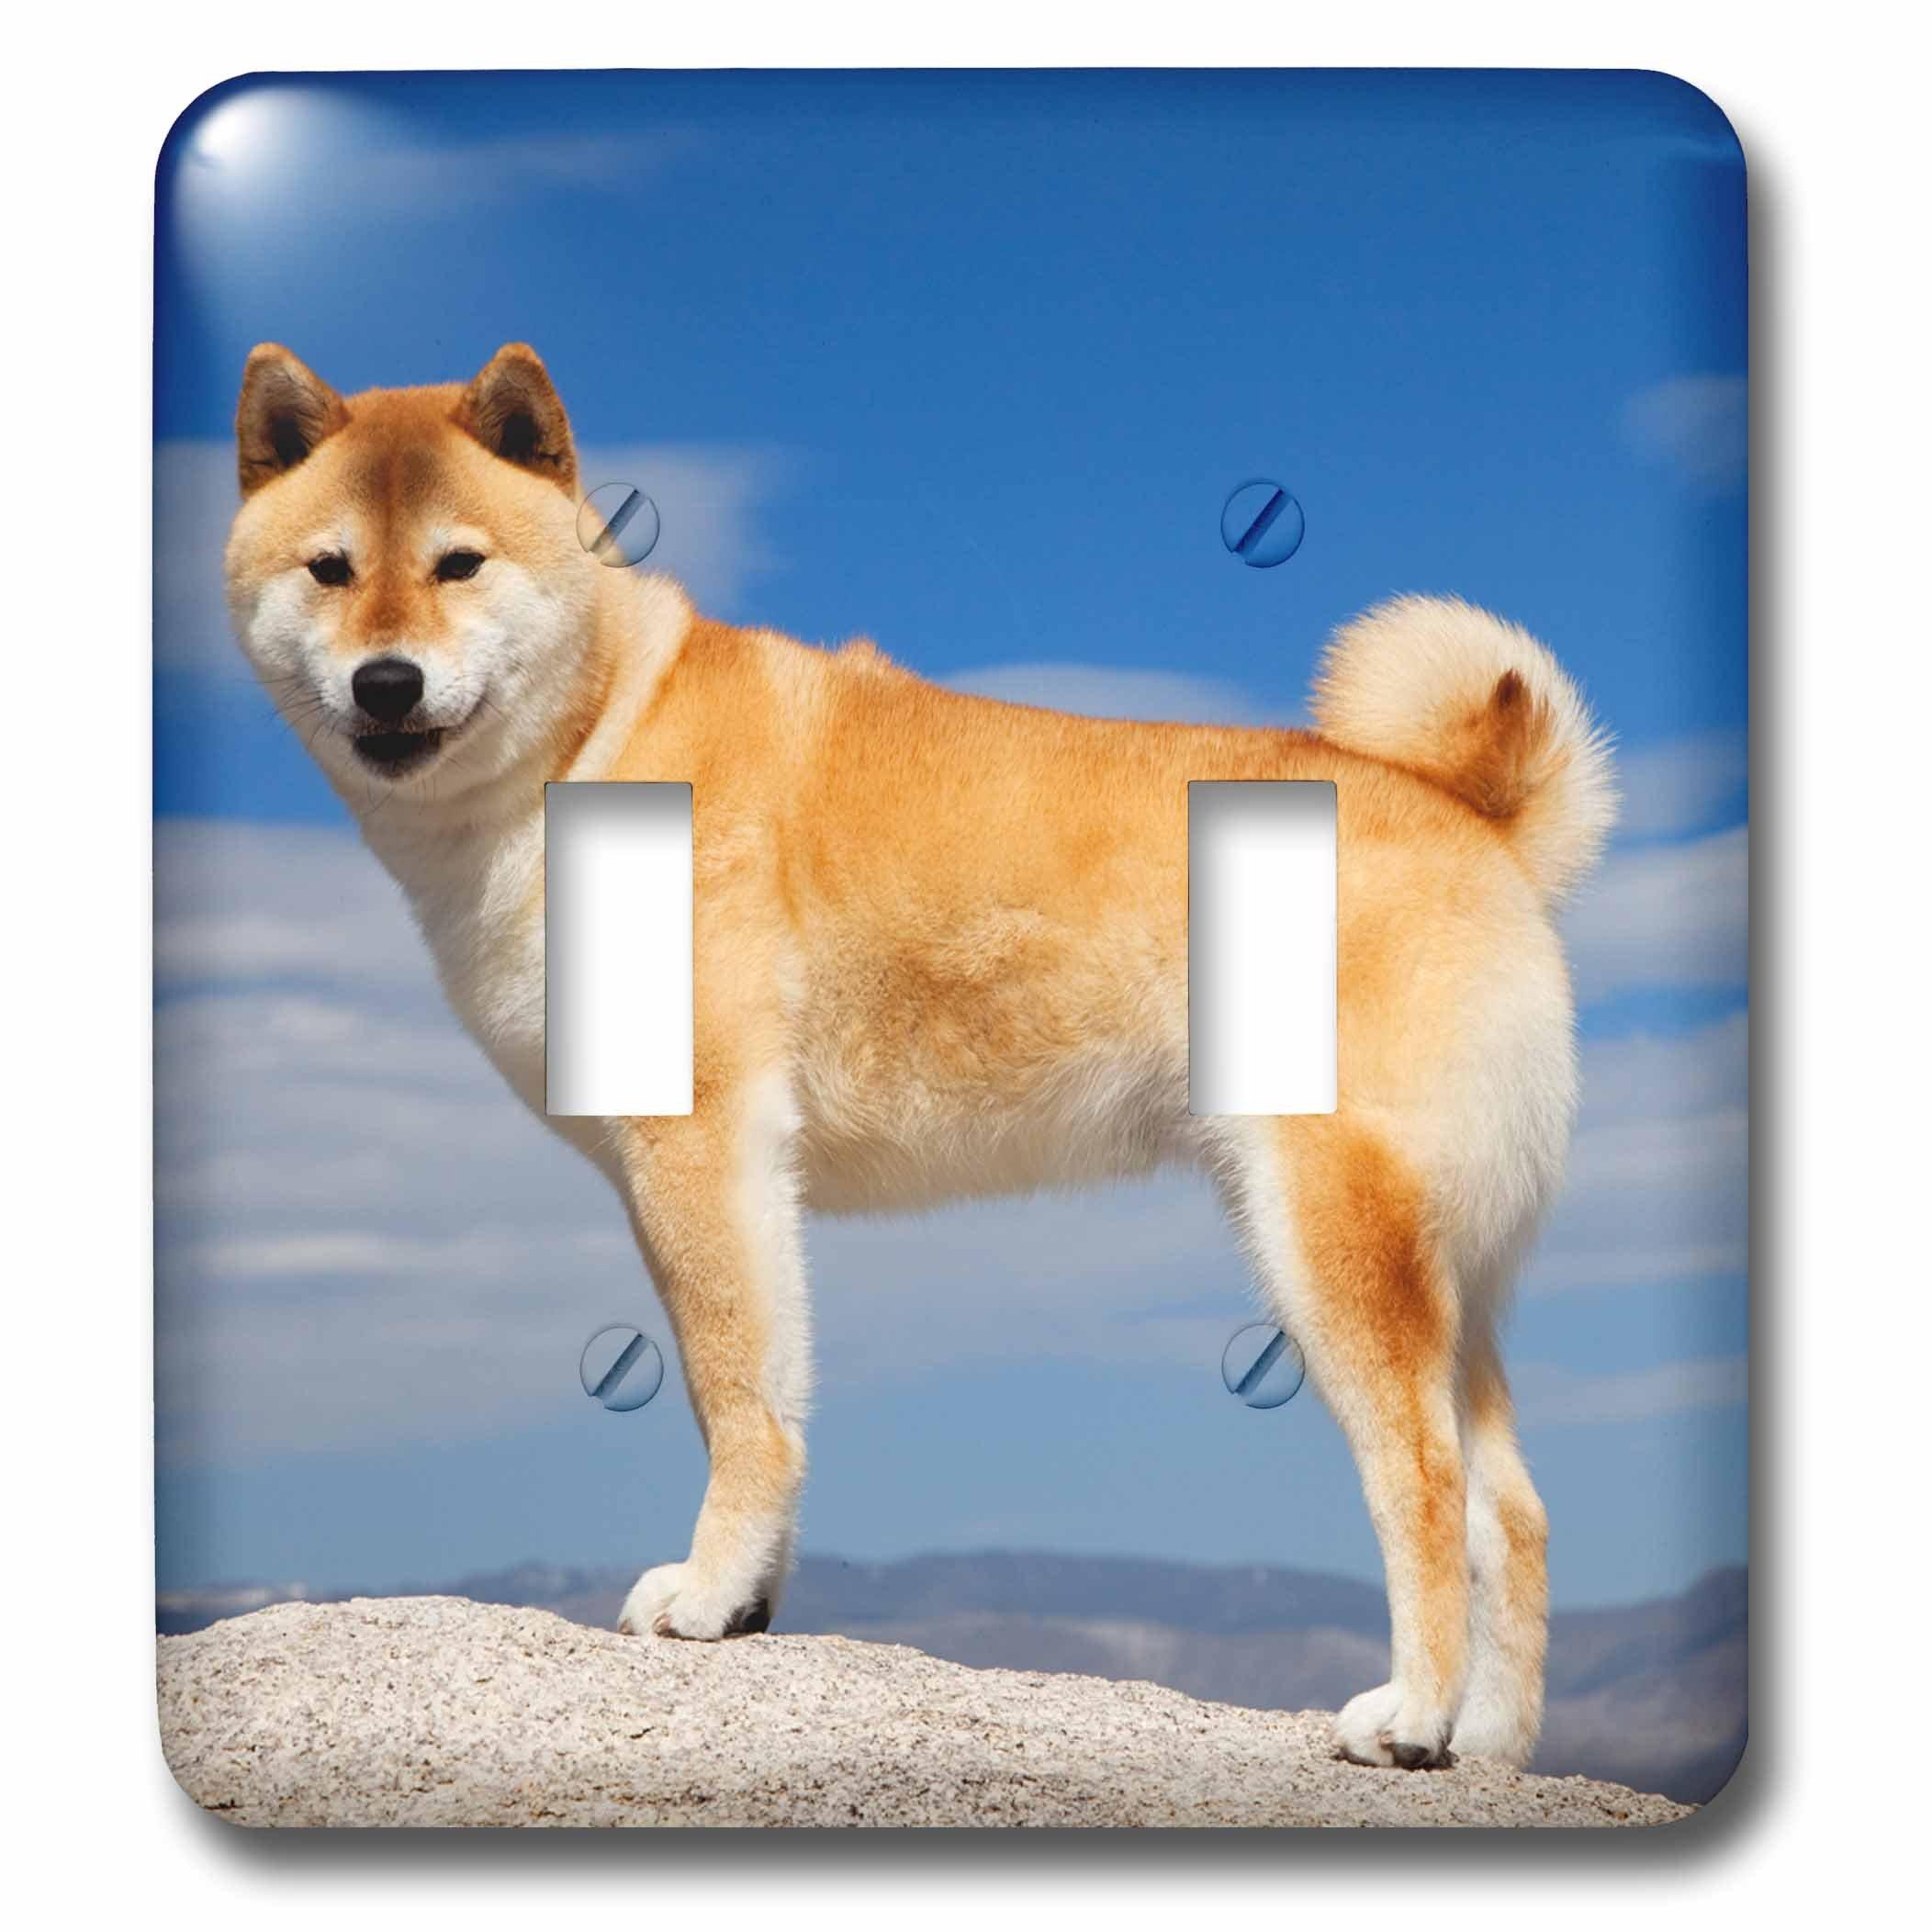 3dRose LSP_258815_2 USA, California, Bishop. Shiba Inu Dog Posing Toggle Switch,